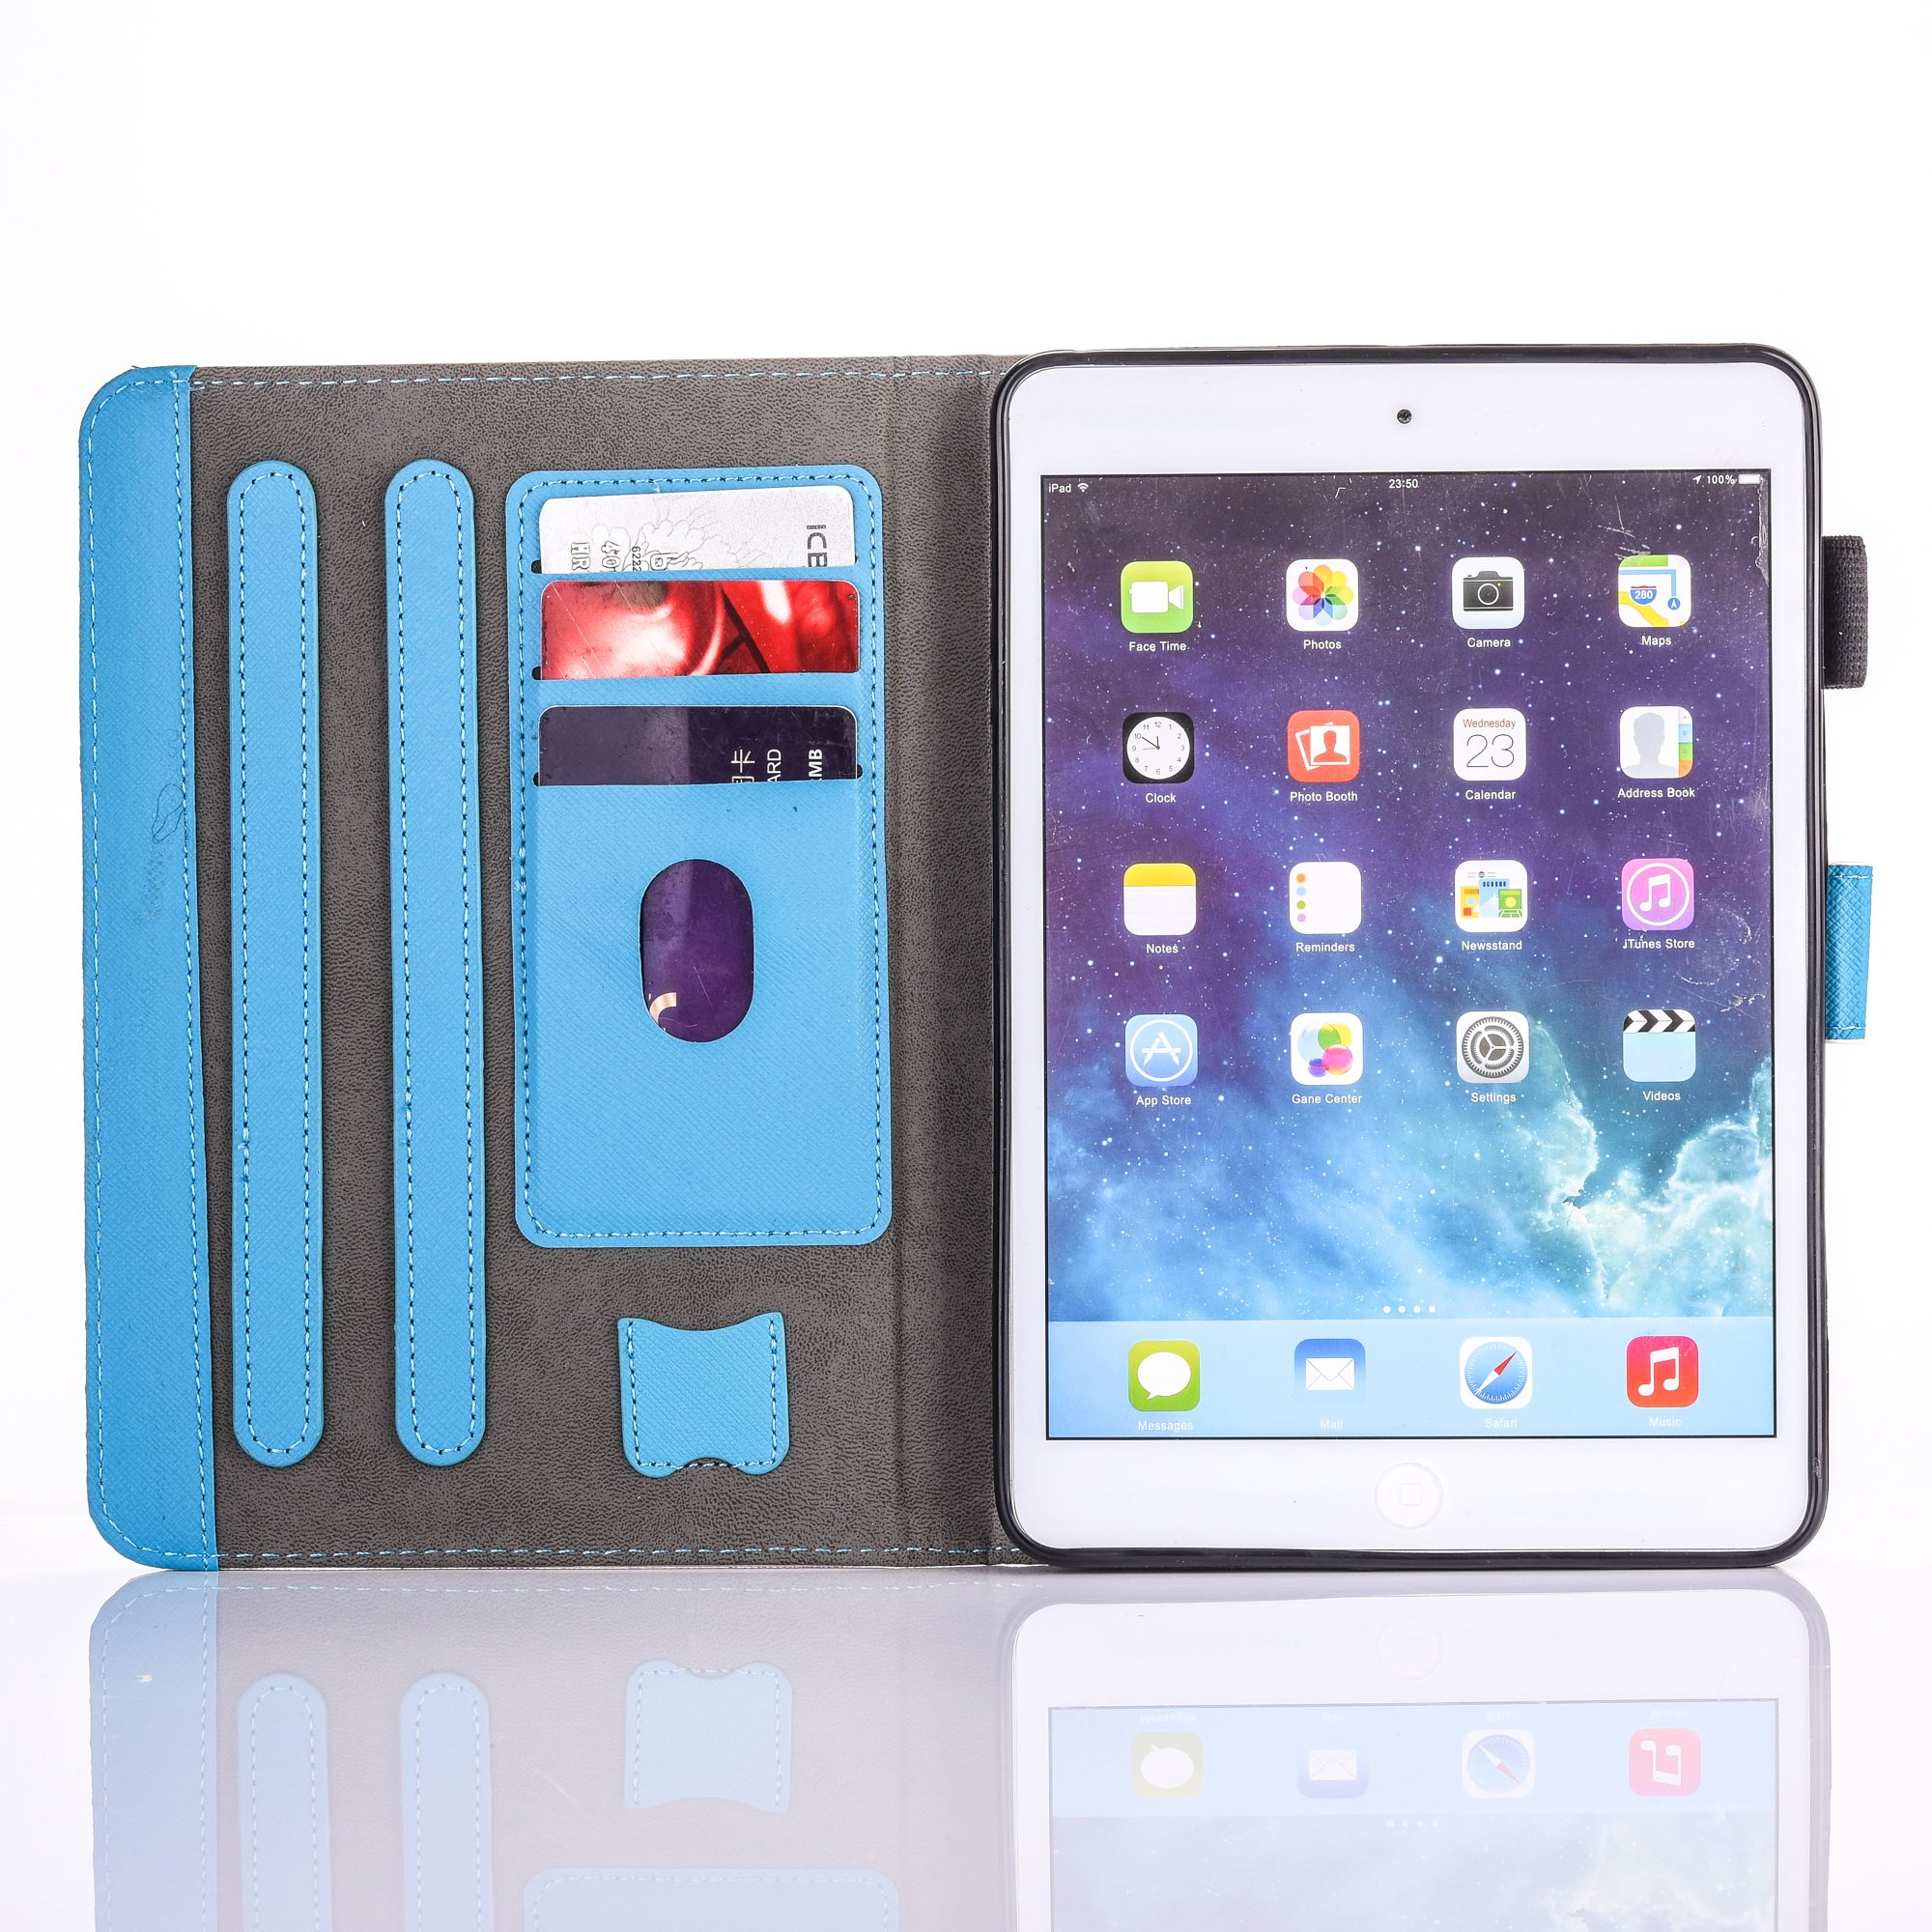 iPad Air 2/iPad Air/iPad 9.7 inch 2017 Case, PU Leather Folio [Anti-Slip] Cover with [Magnetic Closure] [Cards Slots] Auto Sleep/Wake for Apple iPad 9.7 2017/iPad Air 1&2 (iPad 5&6), Sketch Cat by Wallace Elec (Image #6)